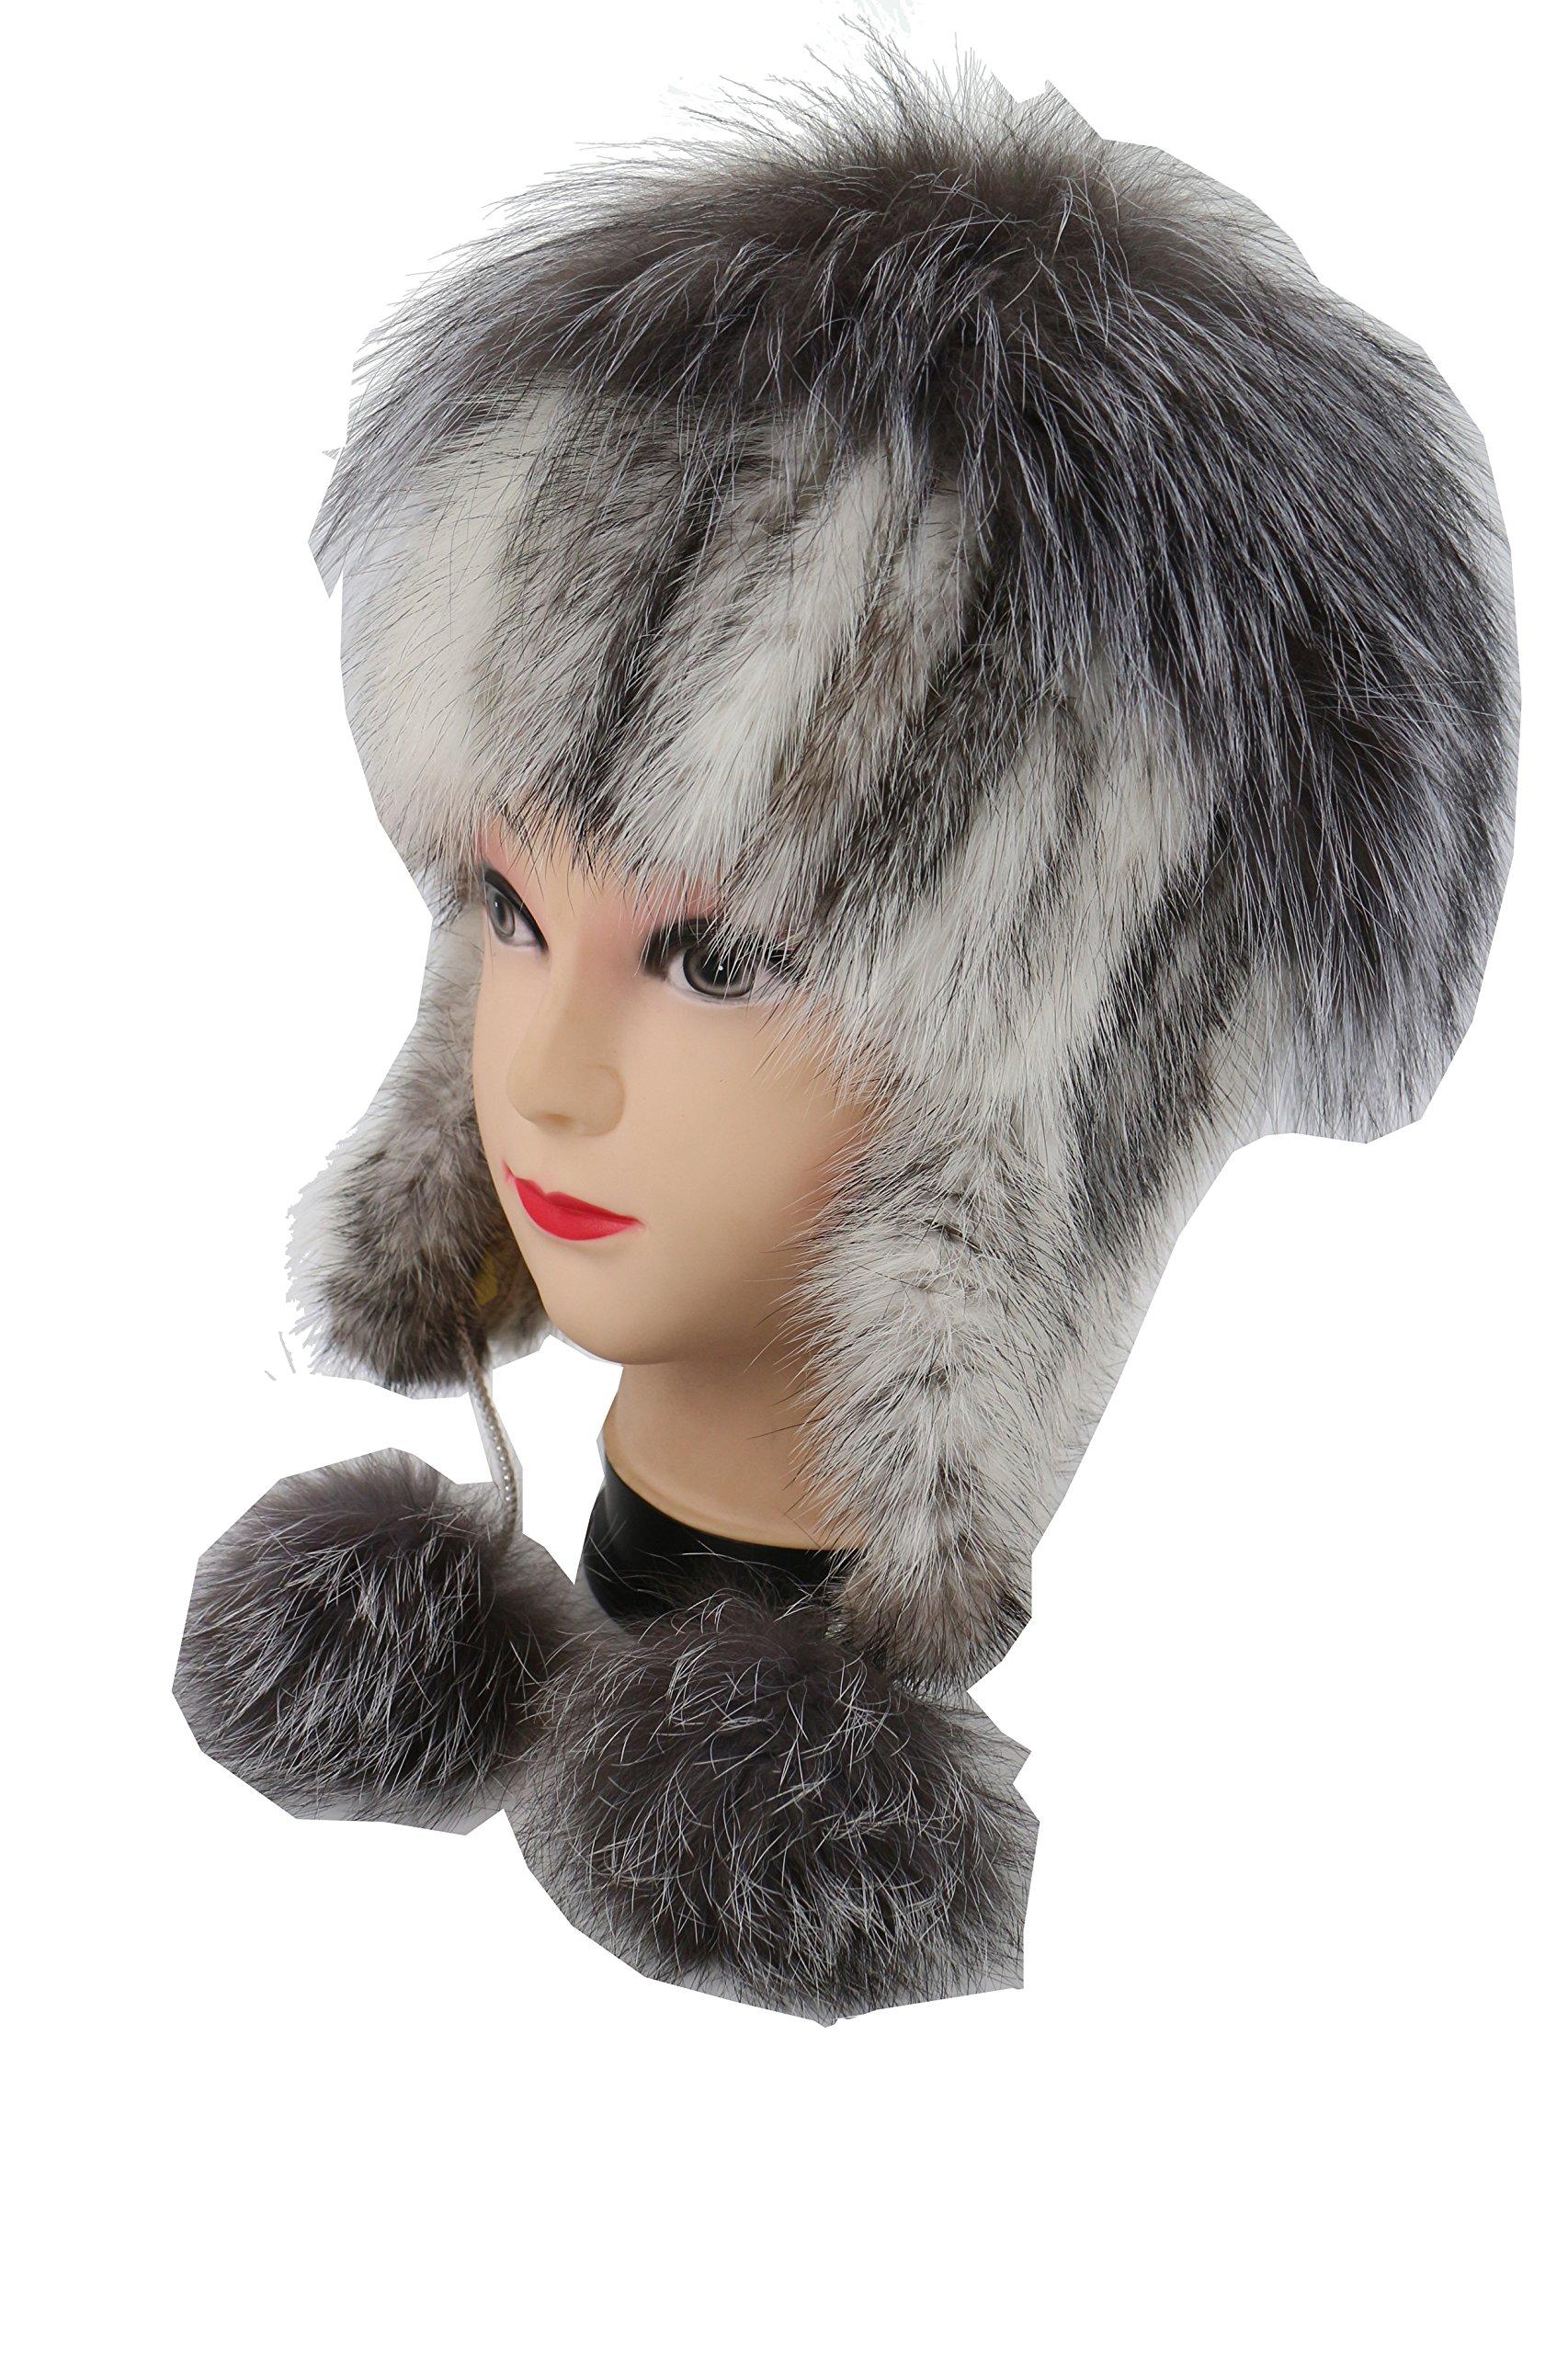 Ysting Real Knit Mink Fur Hat Silver Fox Fur Pom Ear Protection Cap Fur Beanie (C)